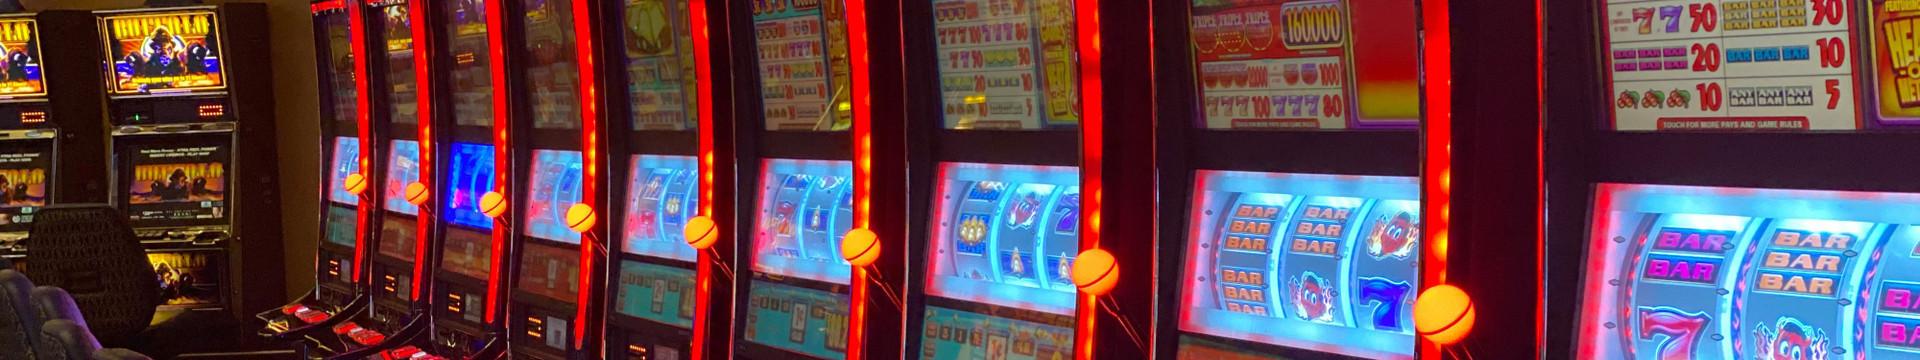 Poker - Westgate Las Vegas